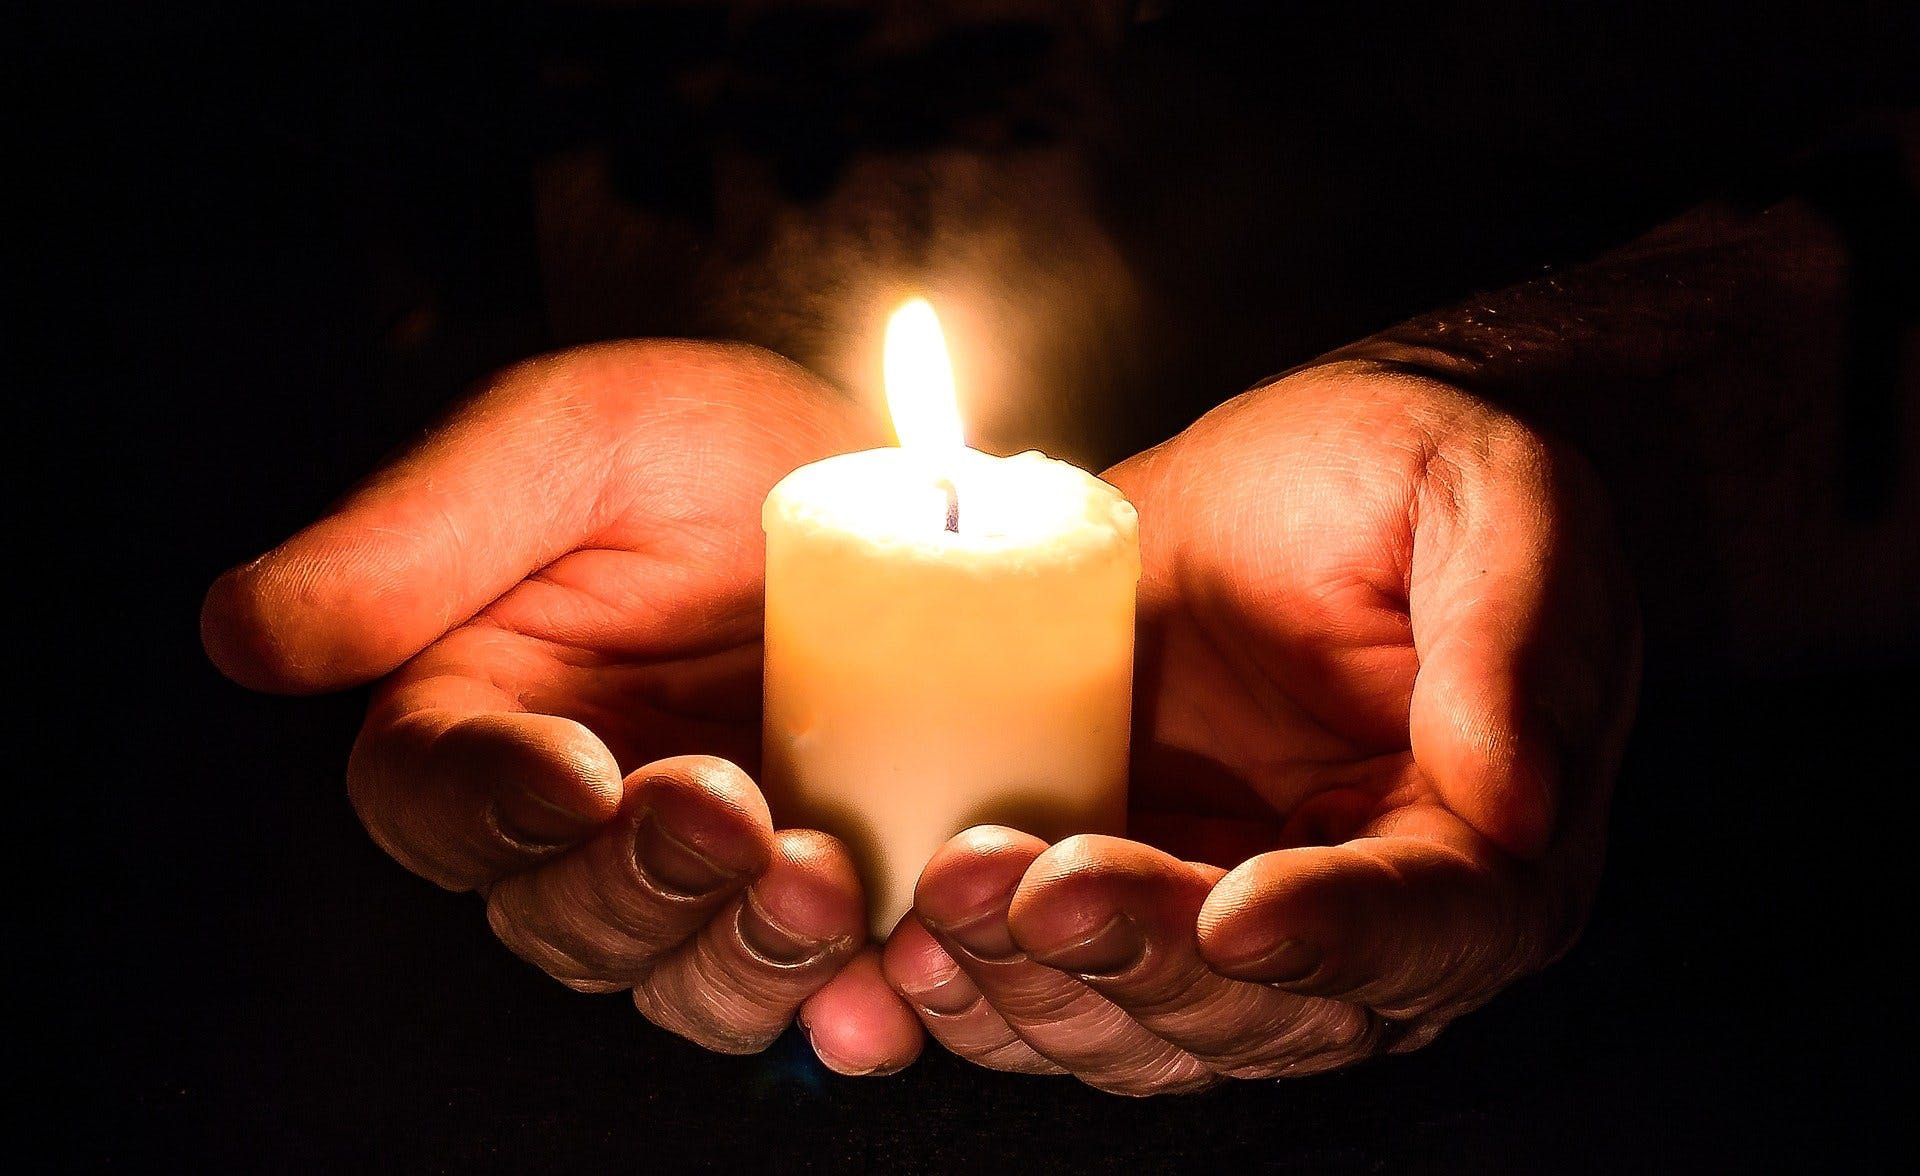 Cartes de condoléances : que dire à qui ?